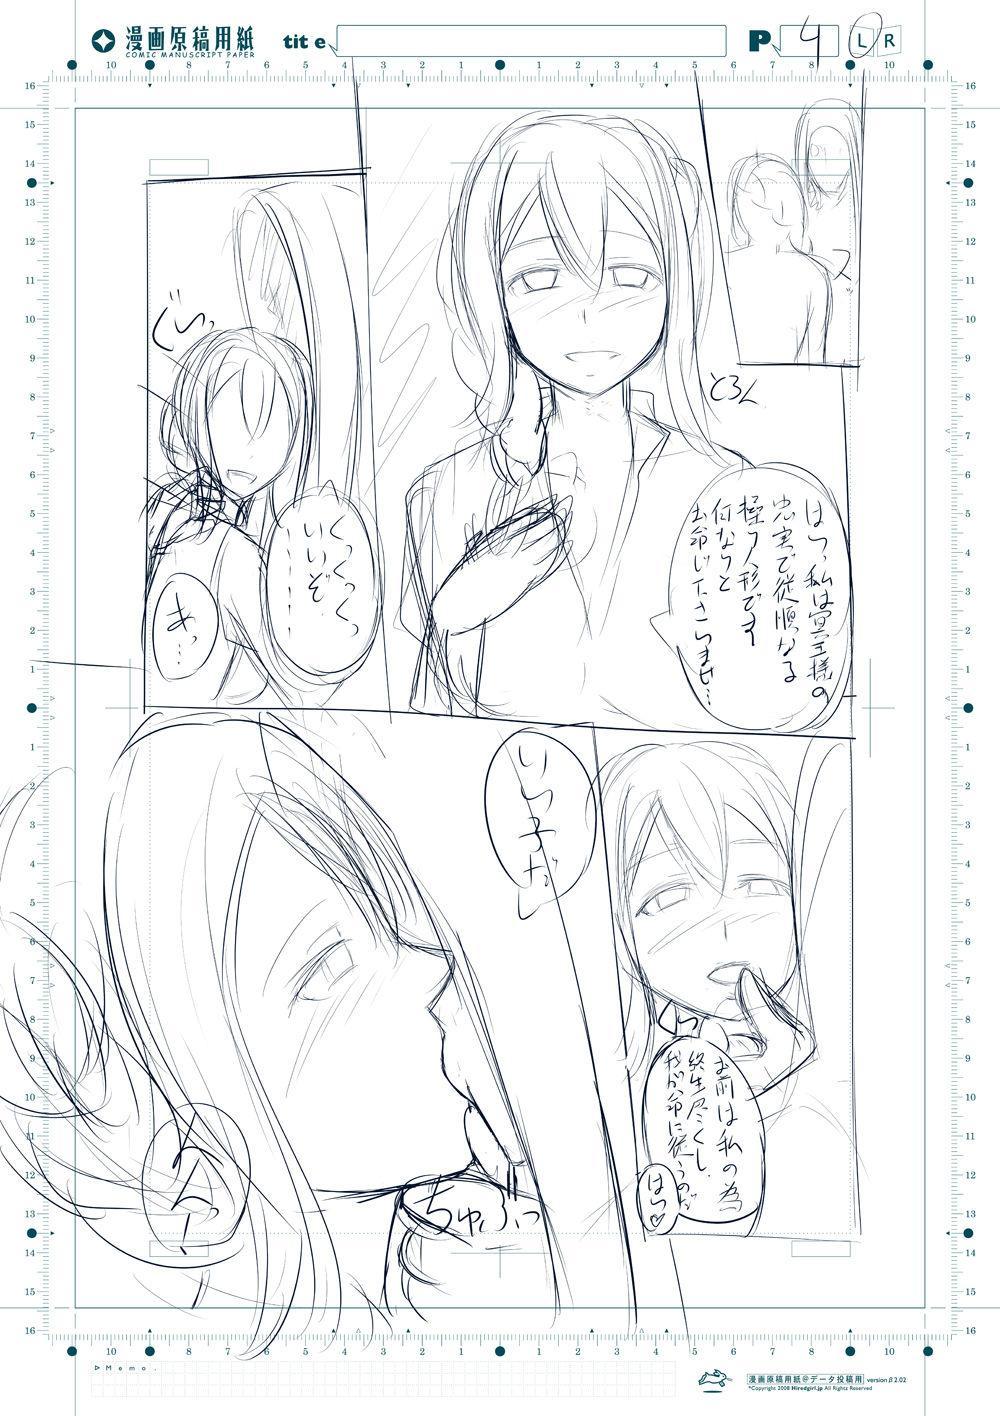 Goblin Slayer Sennou Manga 17